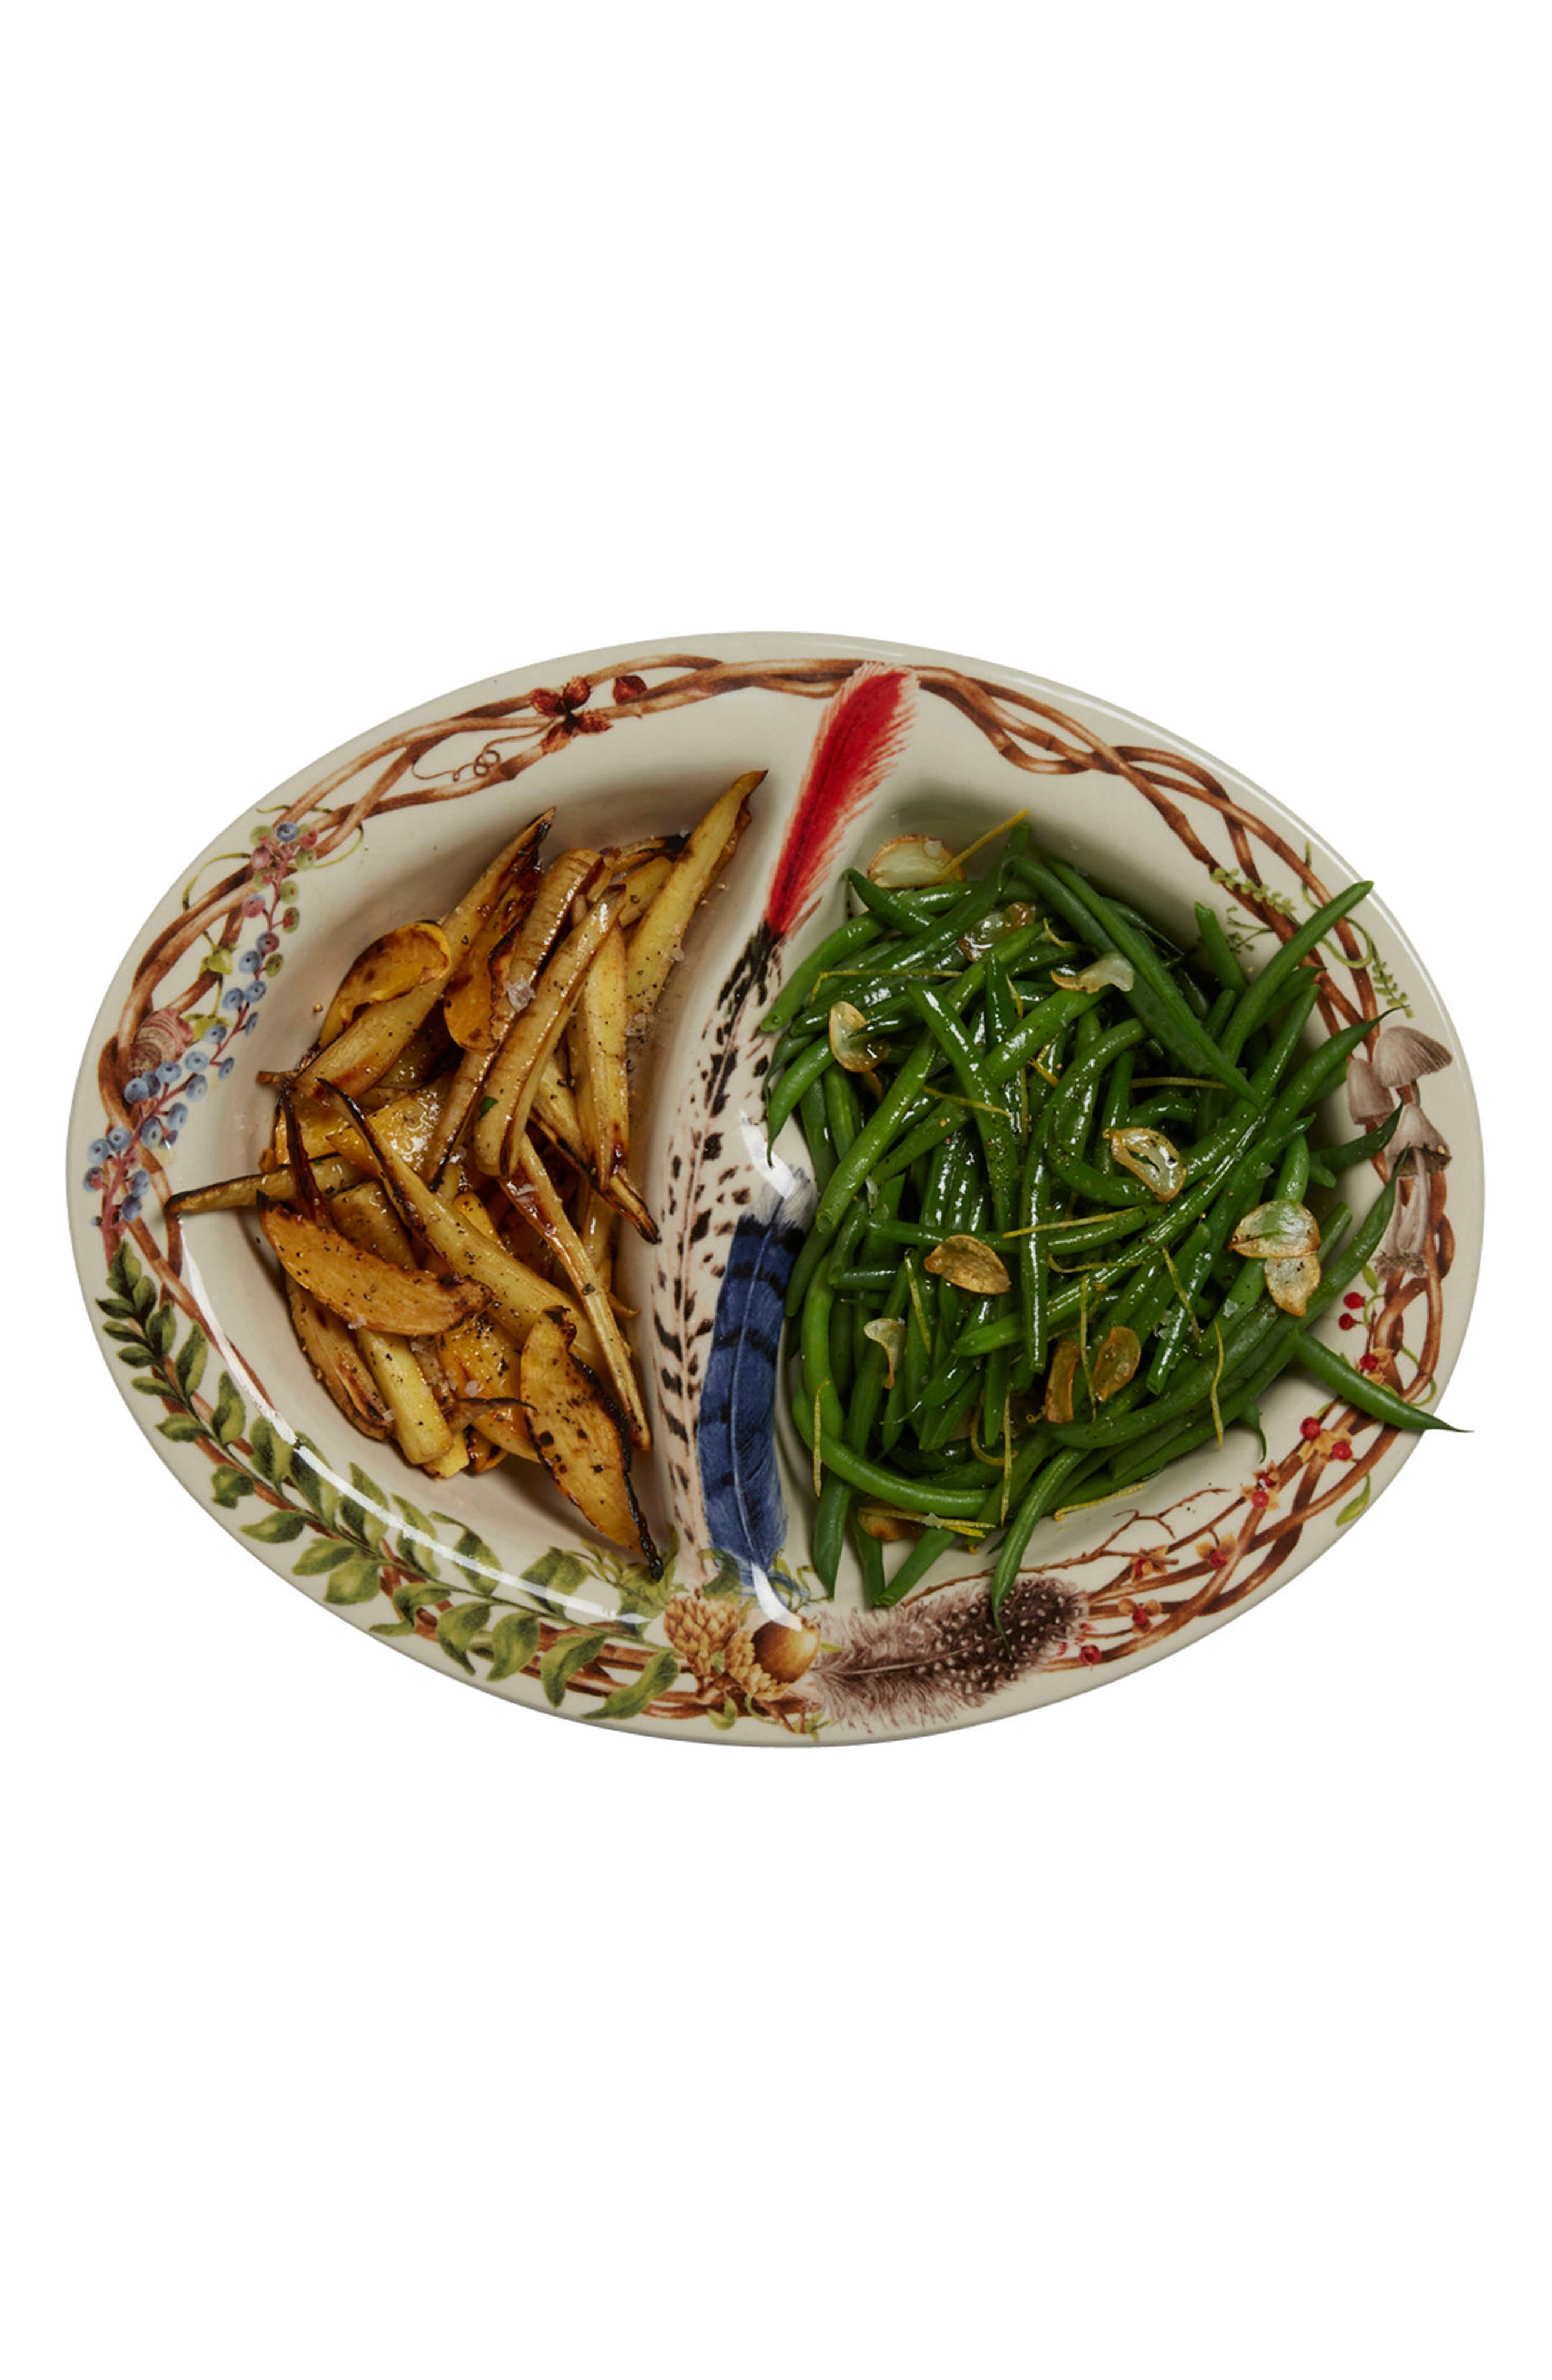 Forest Walk Ceramic Divided Bowl,                             Alternate thumbnail 2, color,                             250